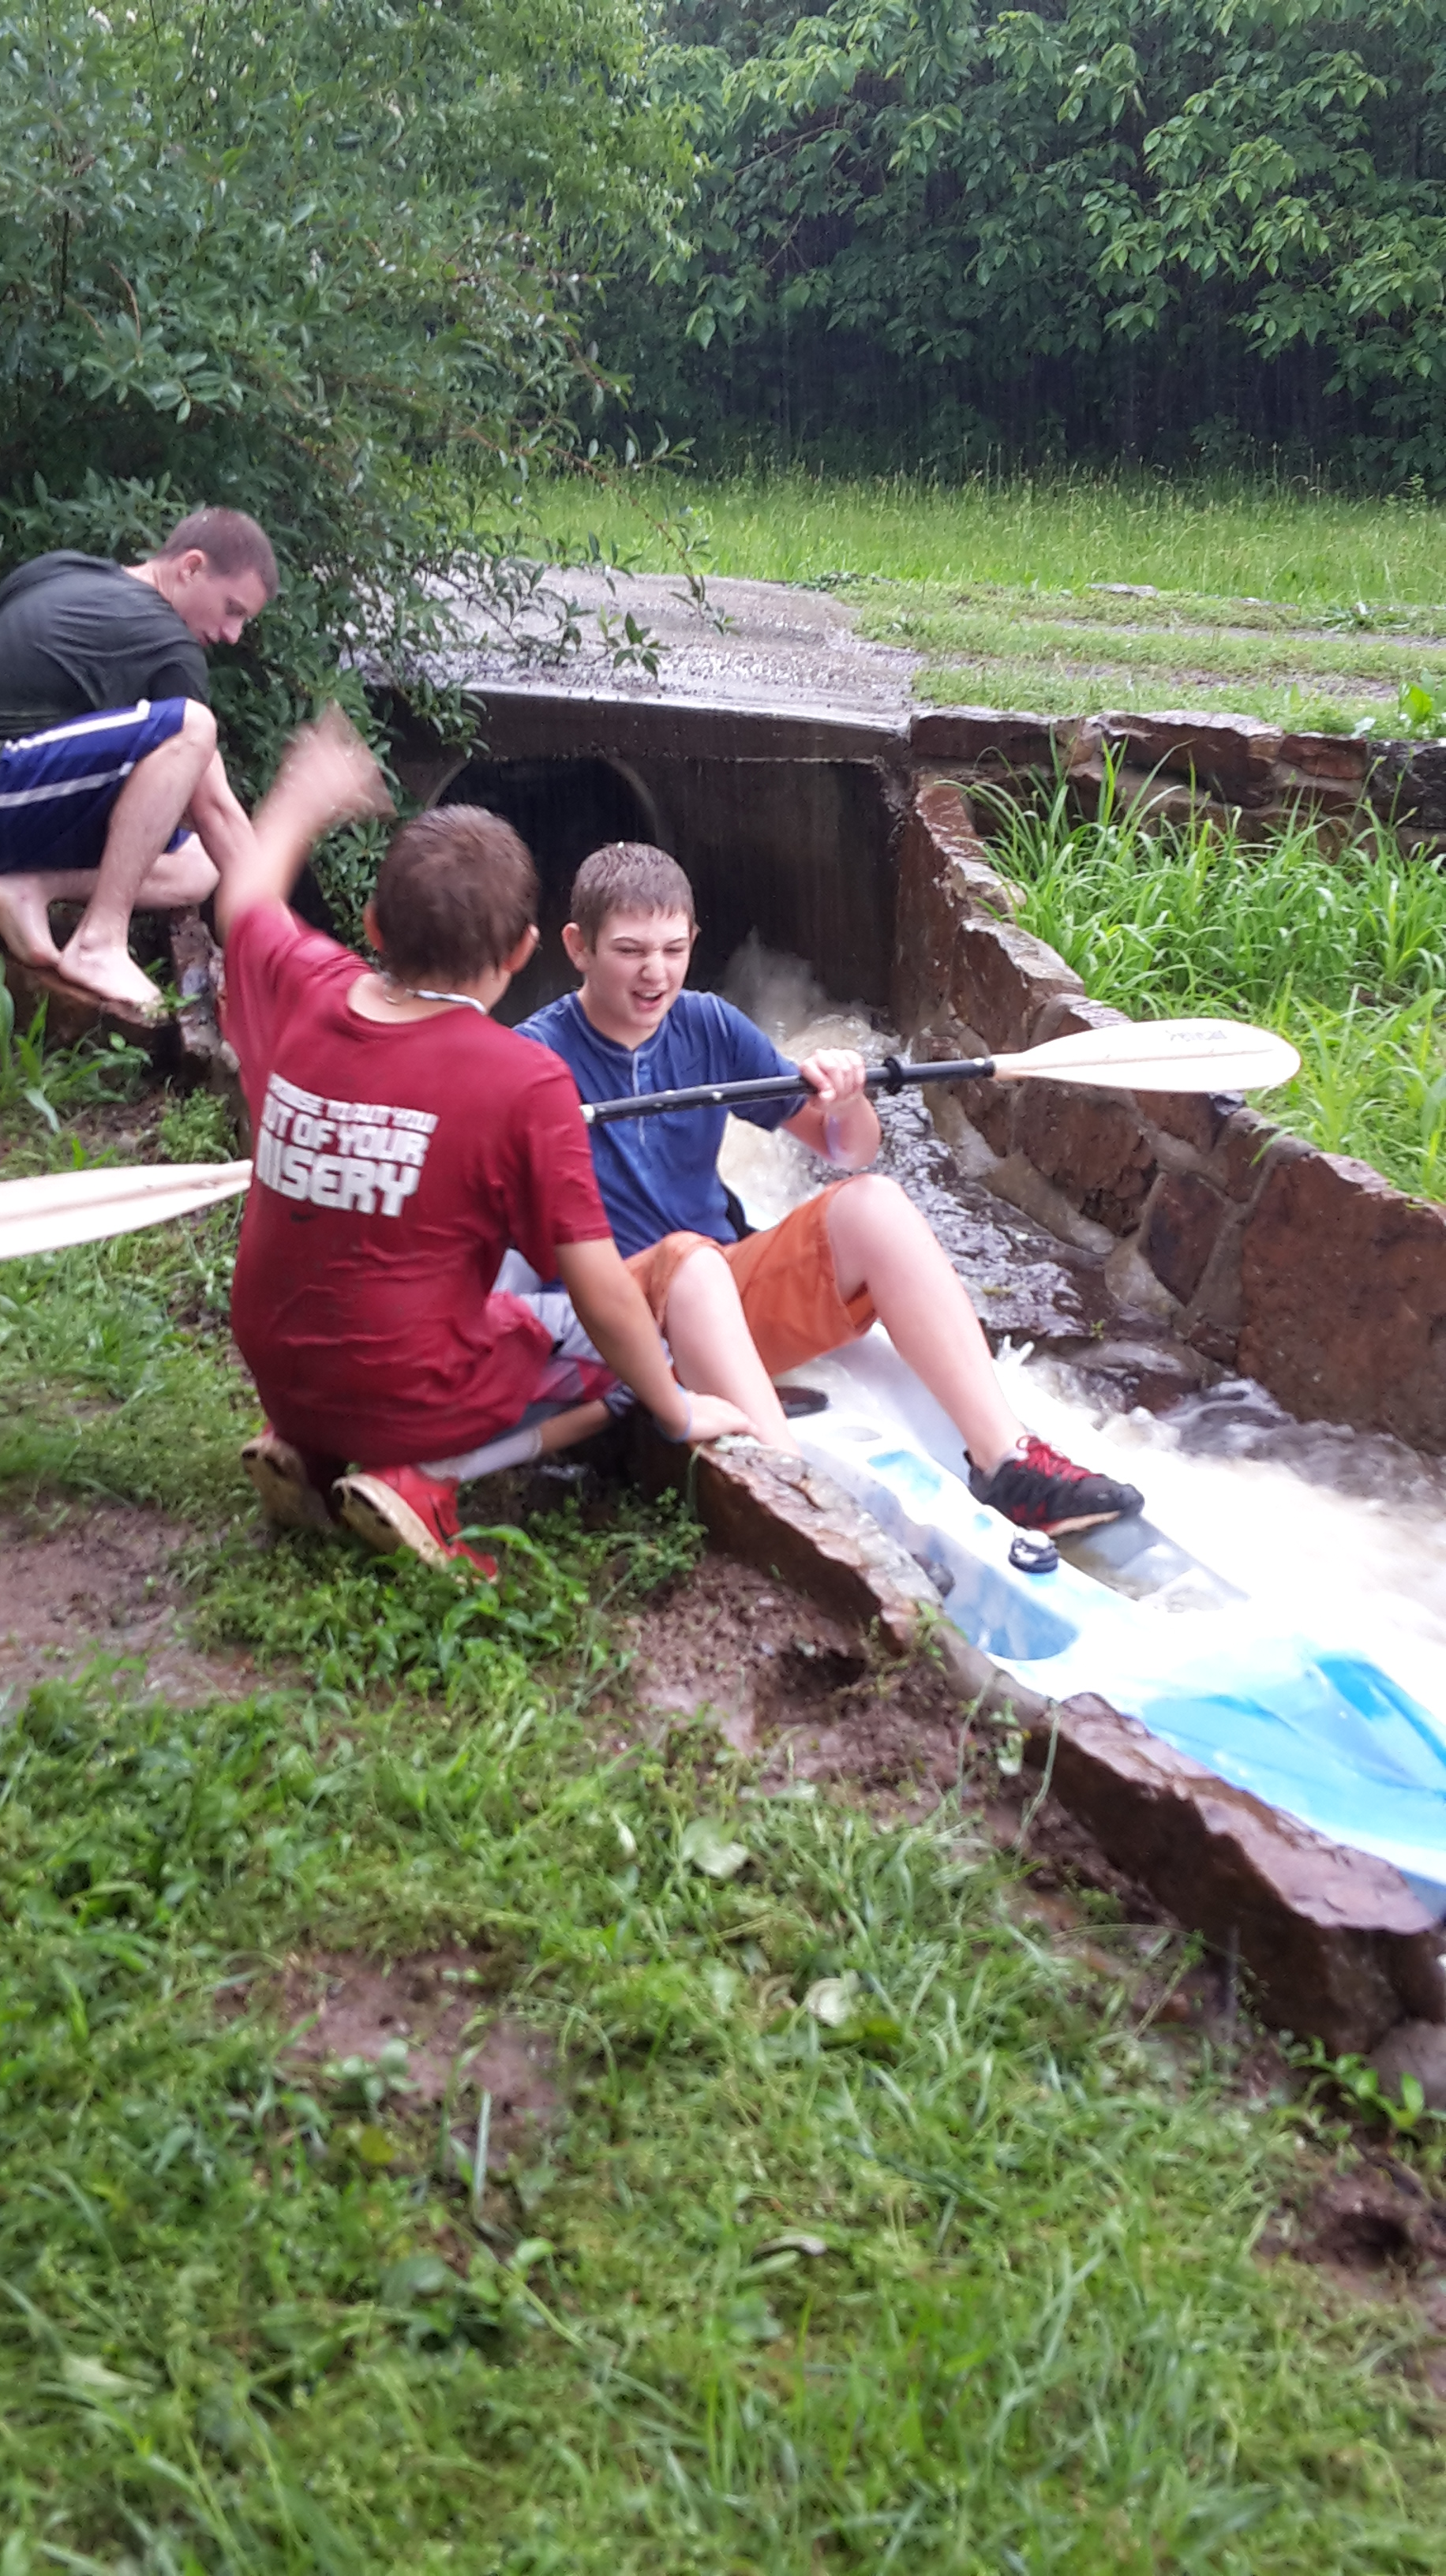 Kiddos making the best of the rainy days. Via 5NEWS viewer Matthew Byron